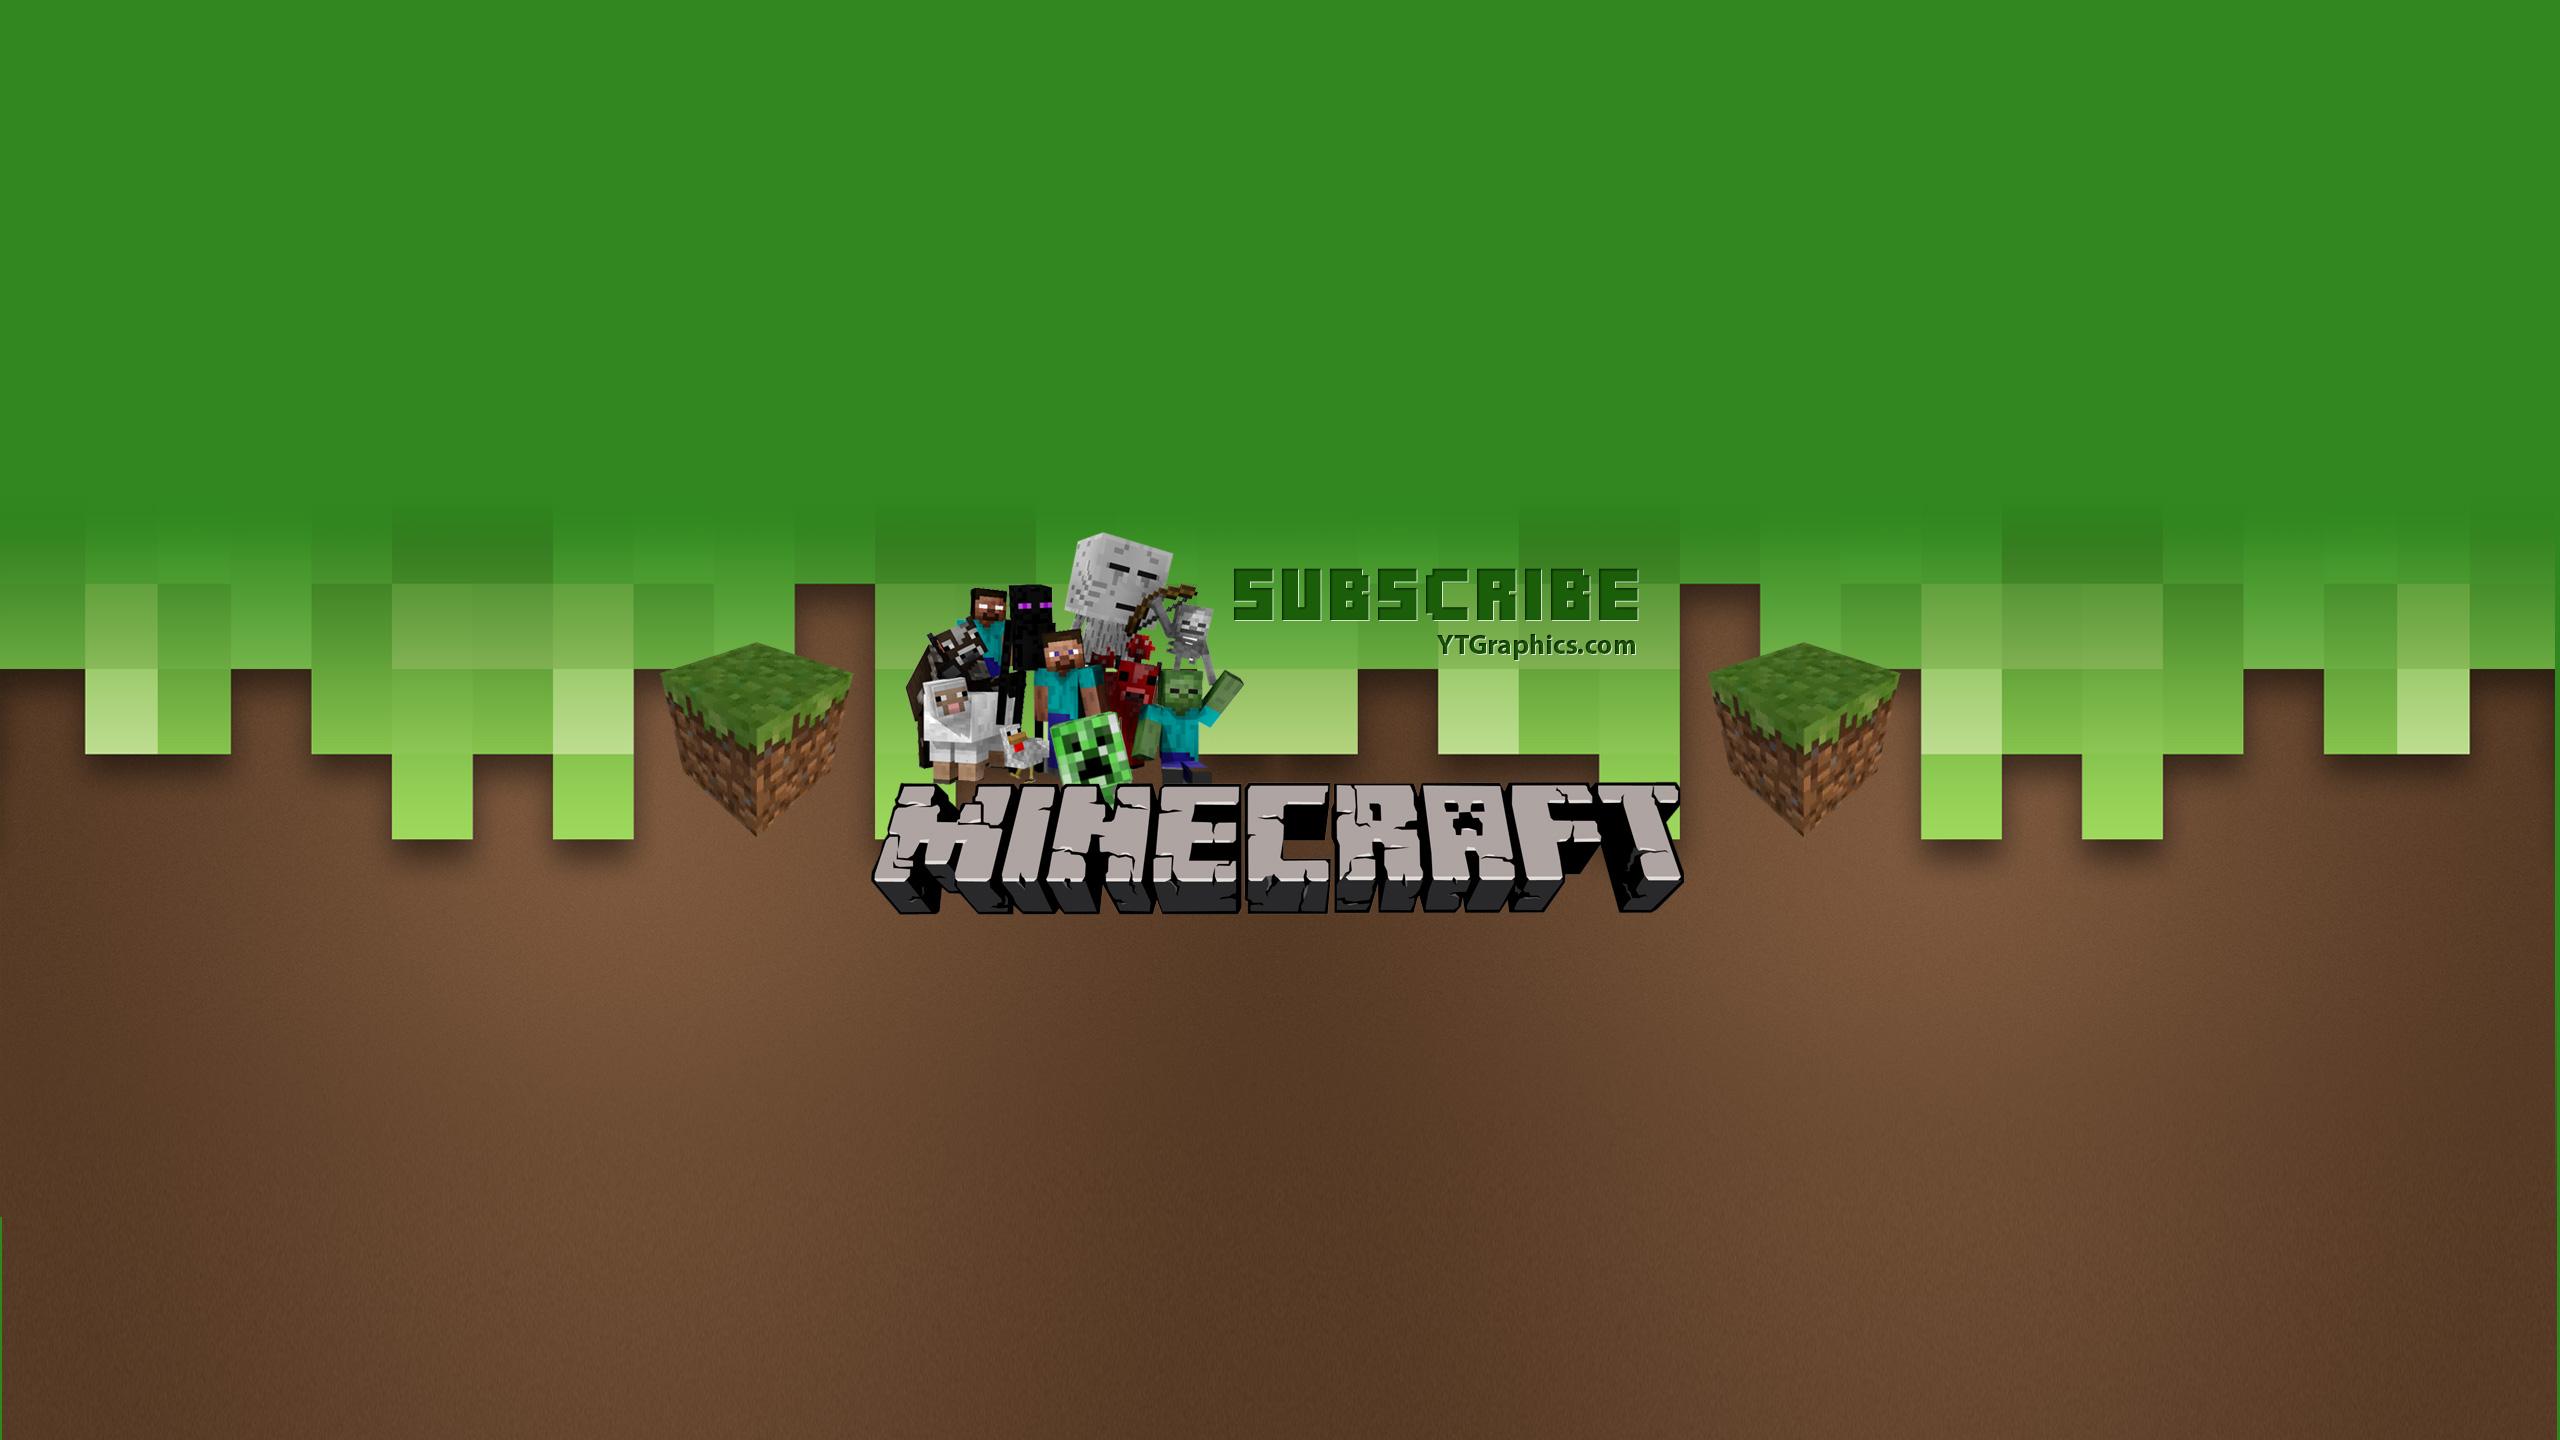 Youtube Of Minecraft Hd Photos Gallery Minecraft Youtube Channel Art Banner 2560x1440 Download Hd Wallpaper Wallpapertip